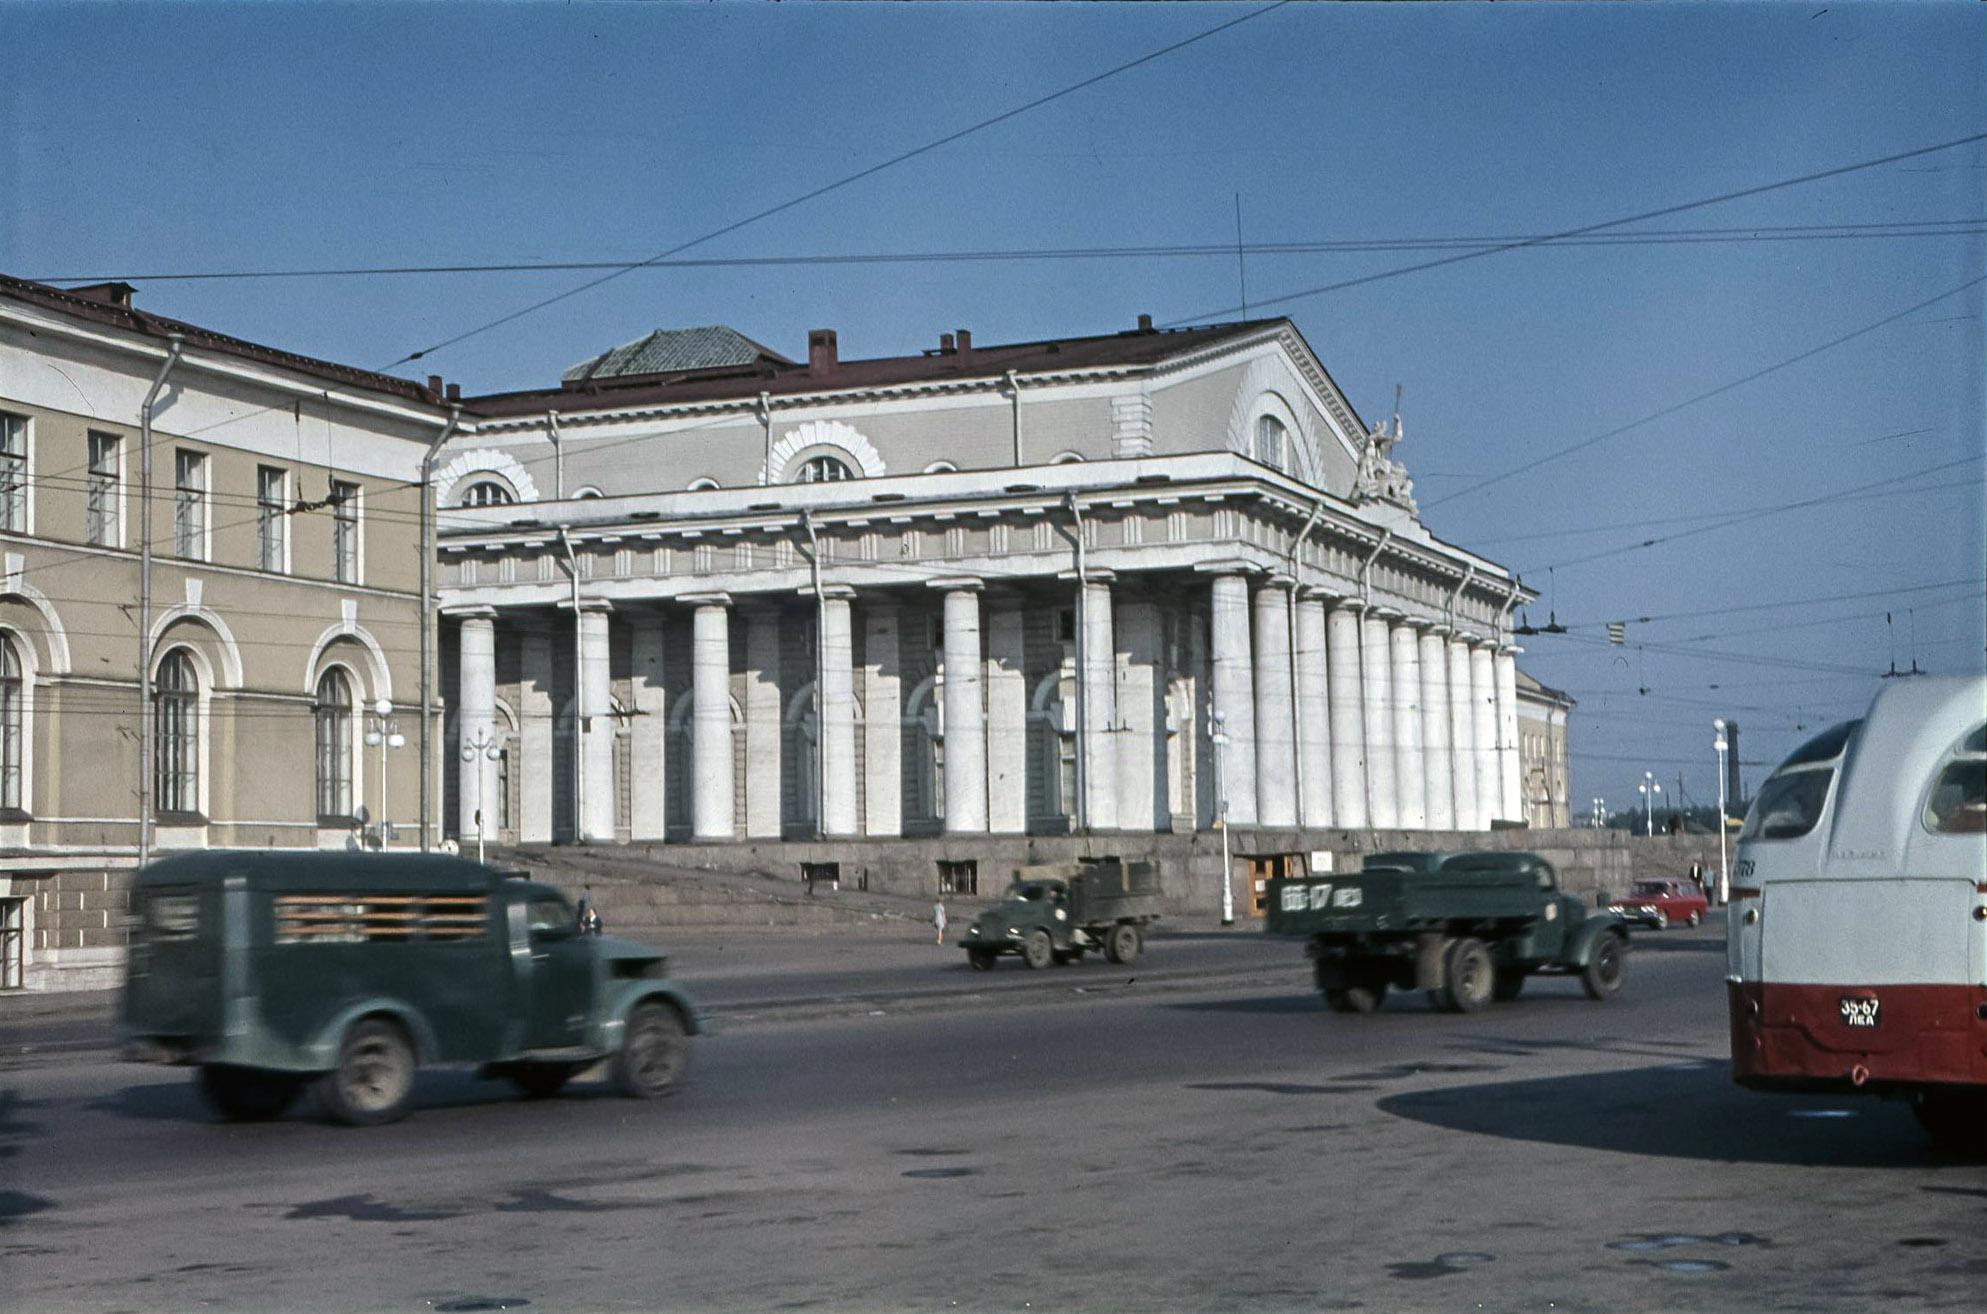 Ленинград.  Военно-морской музей